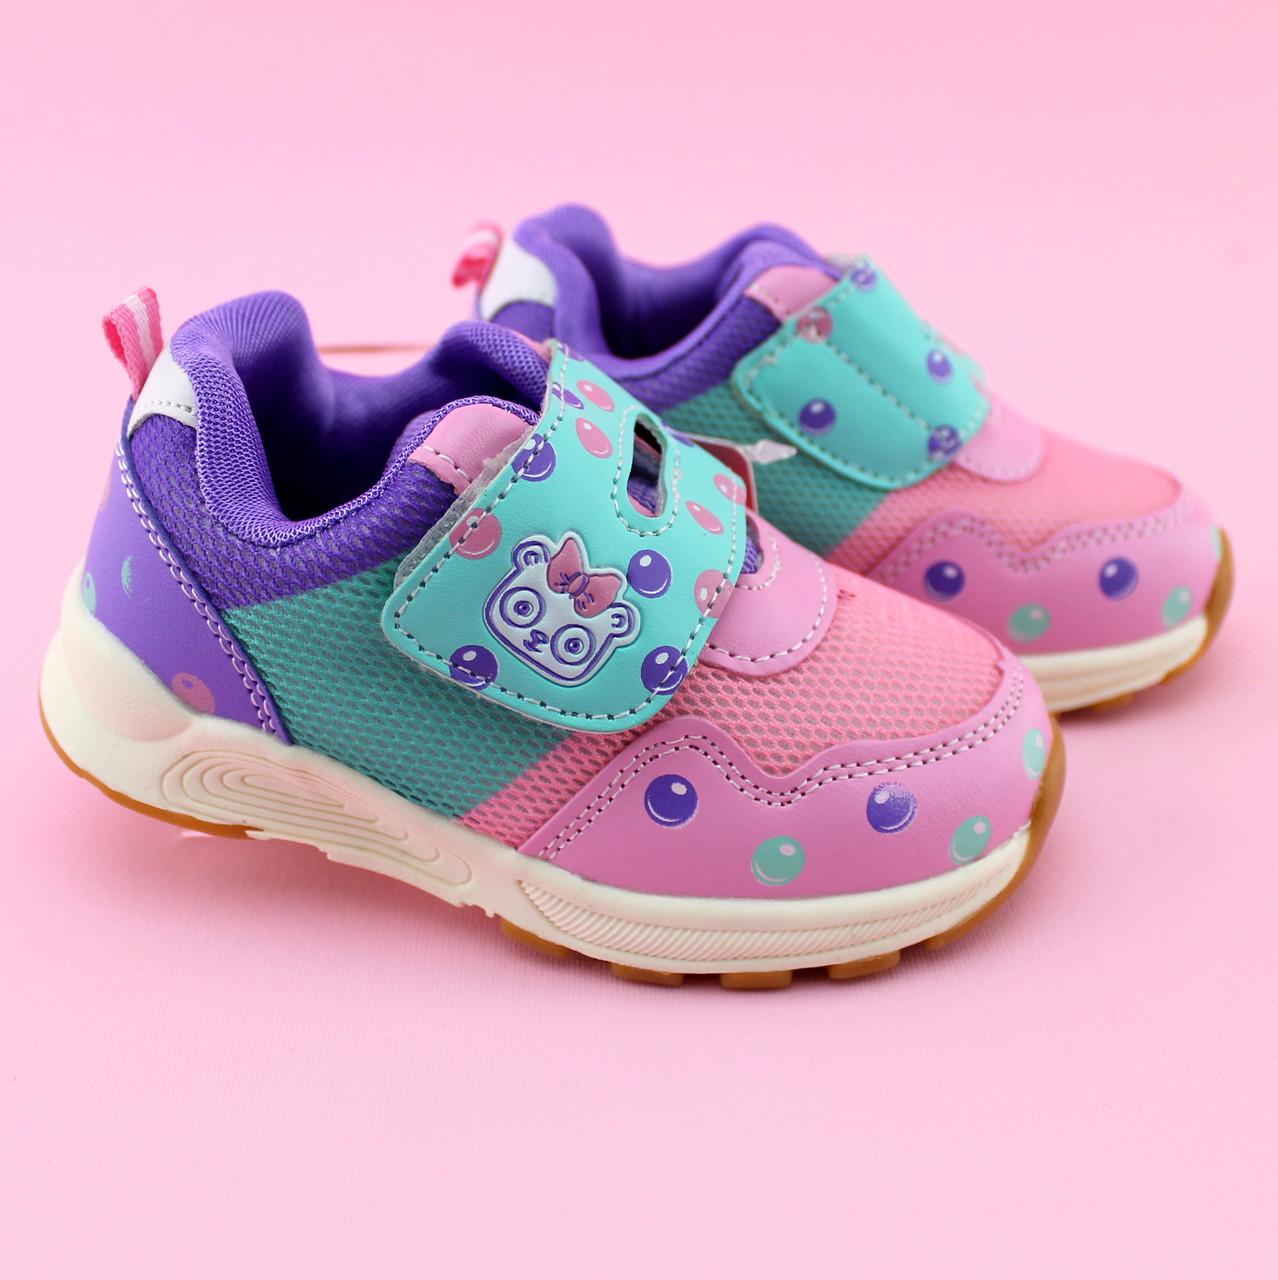 6c86e77c3 Детские кроссовки девочке розовые тм Том.м размер 21,22,25, цена 299 ...